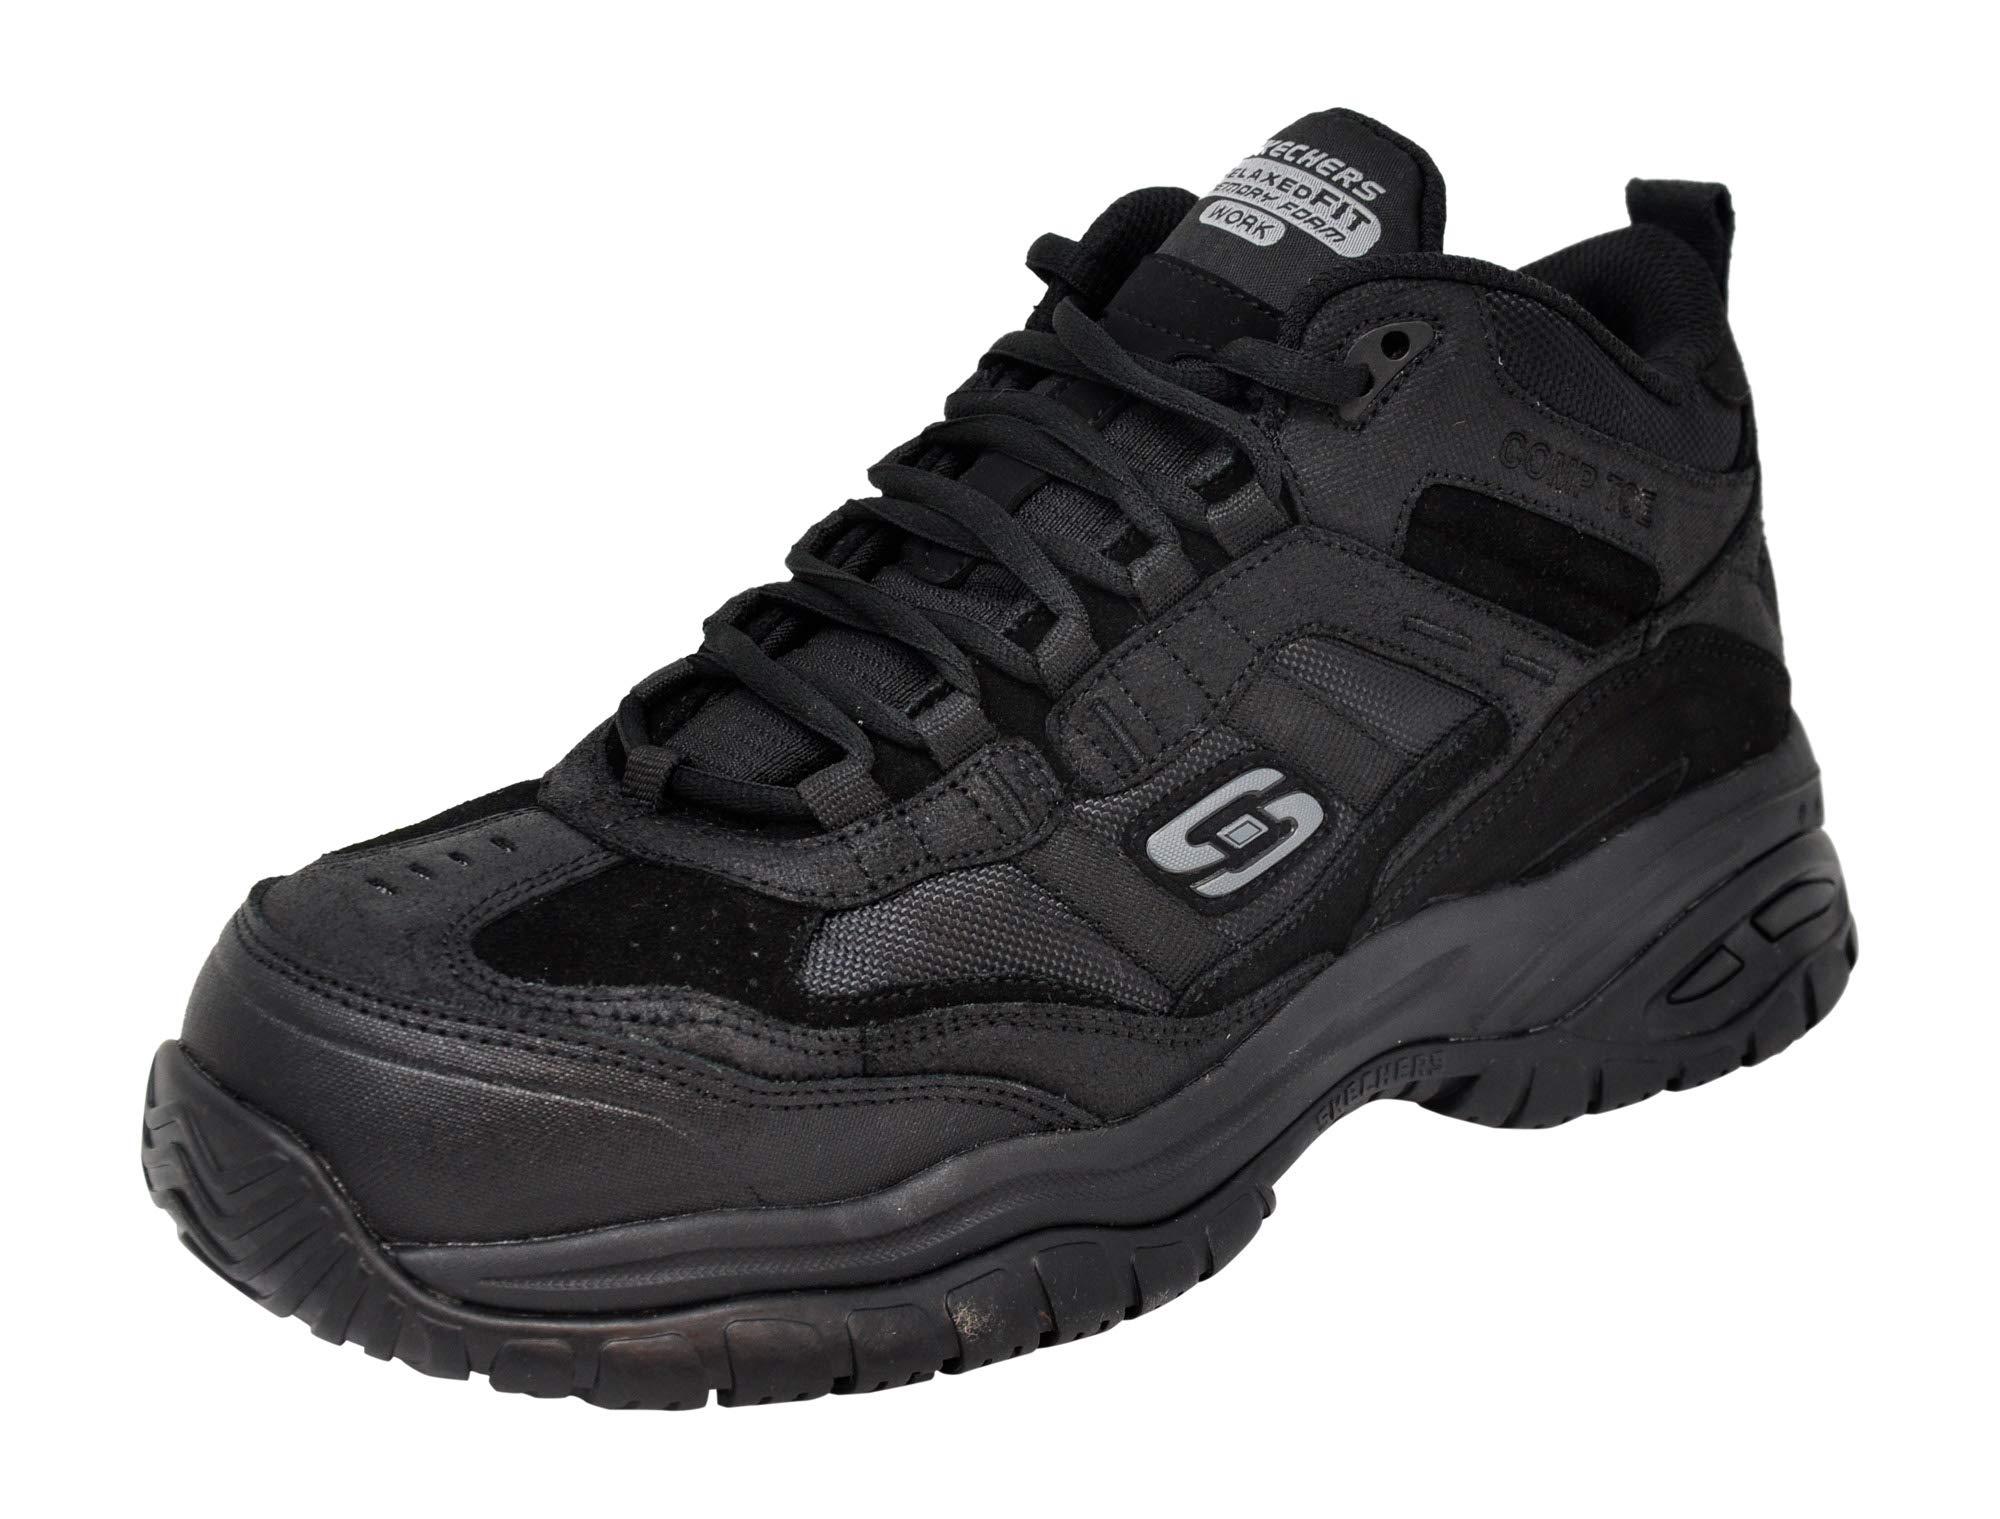 Skechers Men Soft Stride Work Boot, Black/Black, 8.5 M US